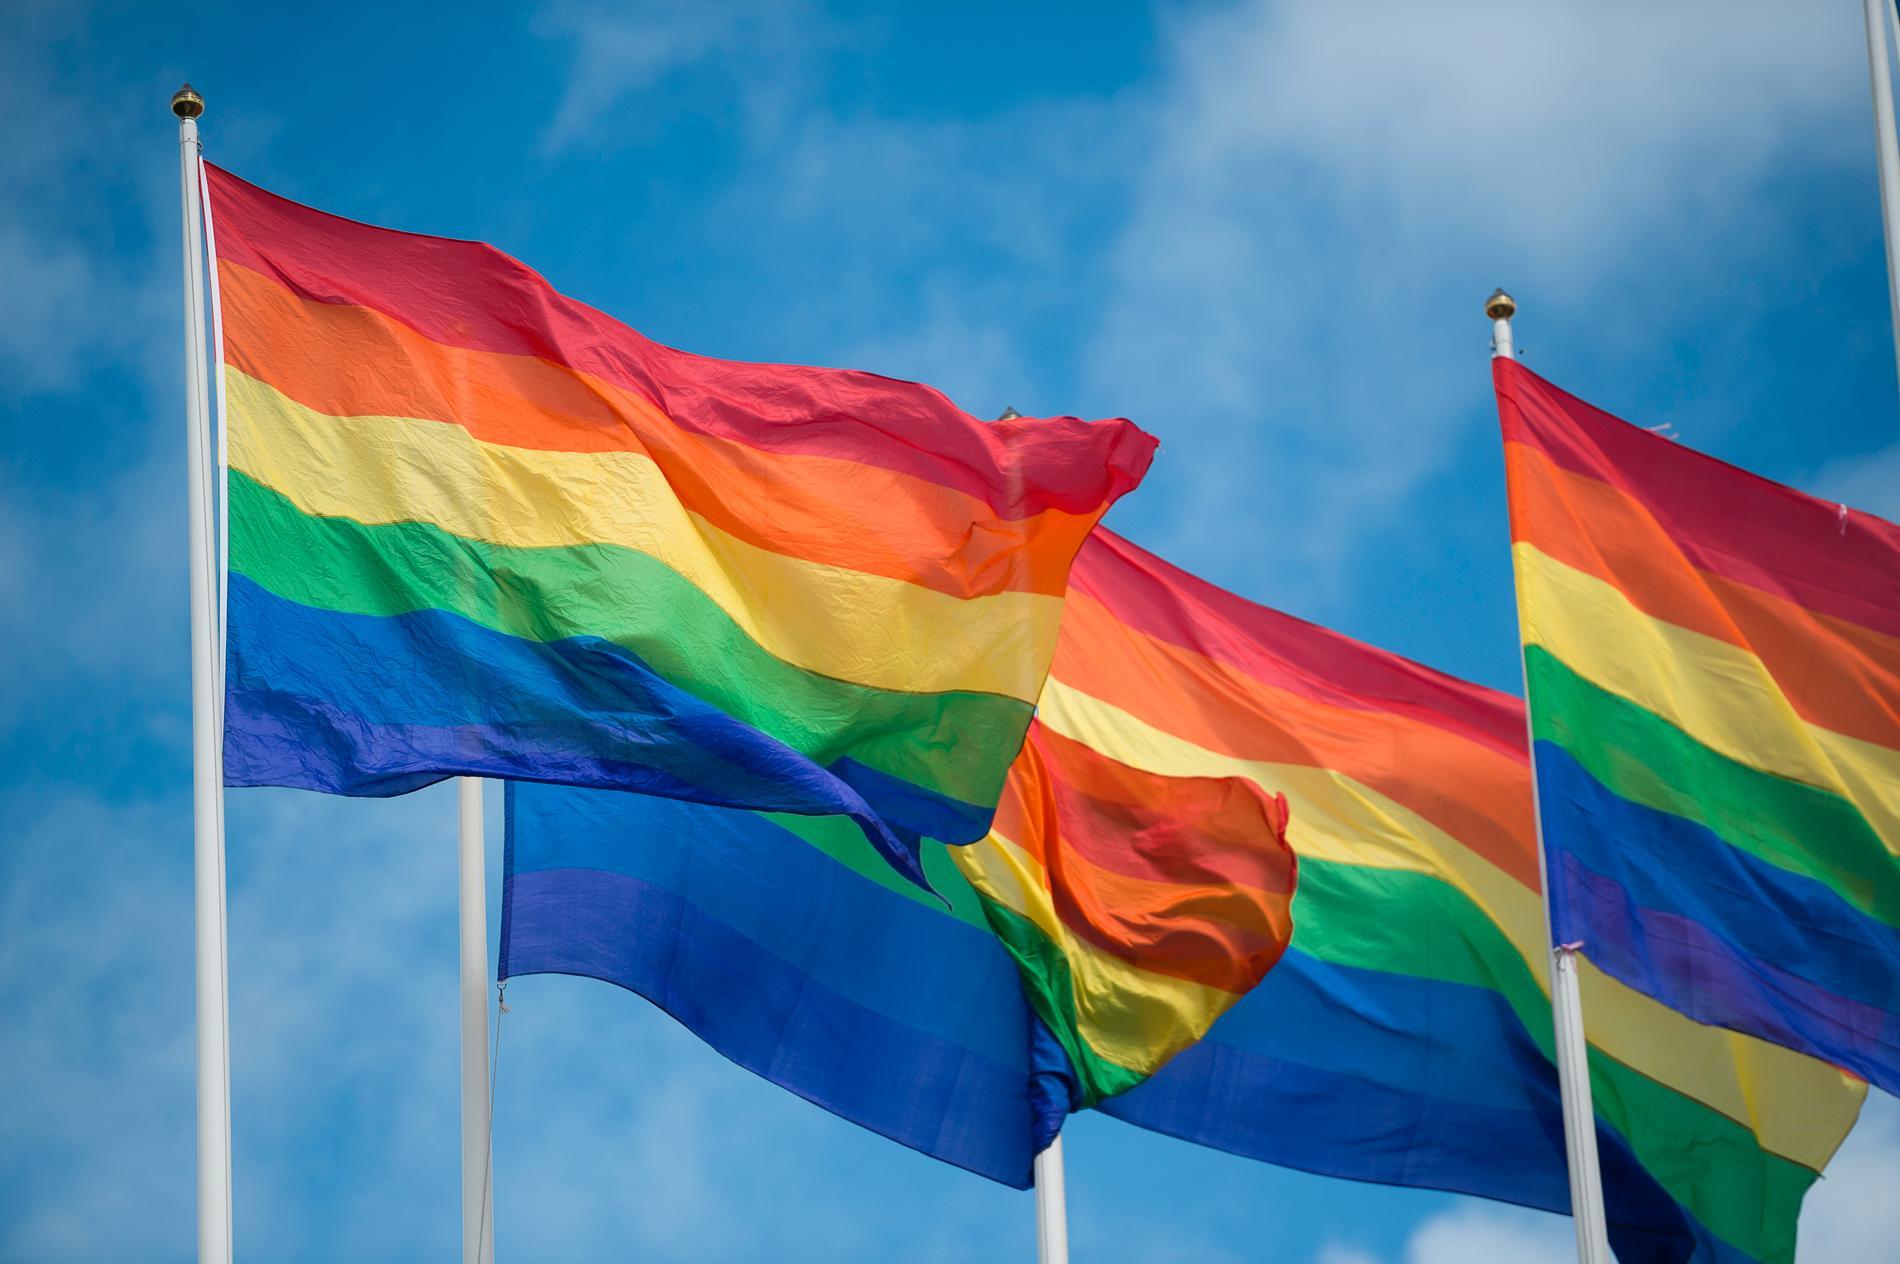 Regnbågsflaggor. Arkivbild.